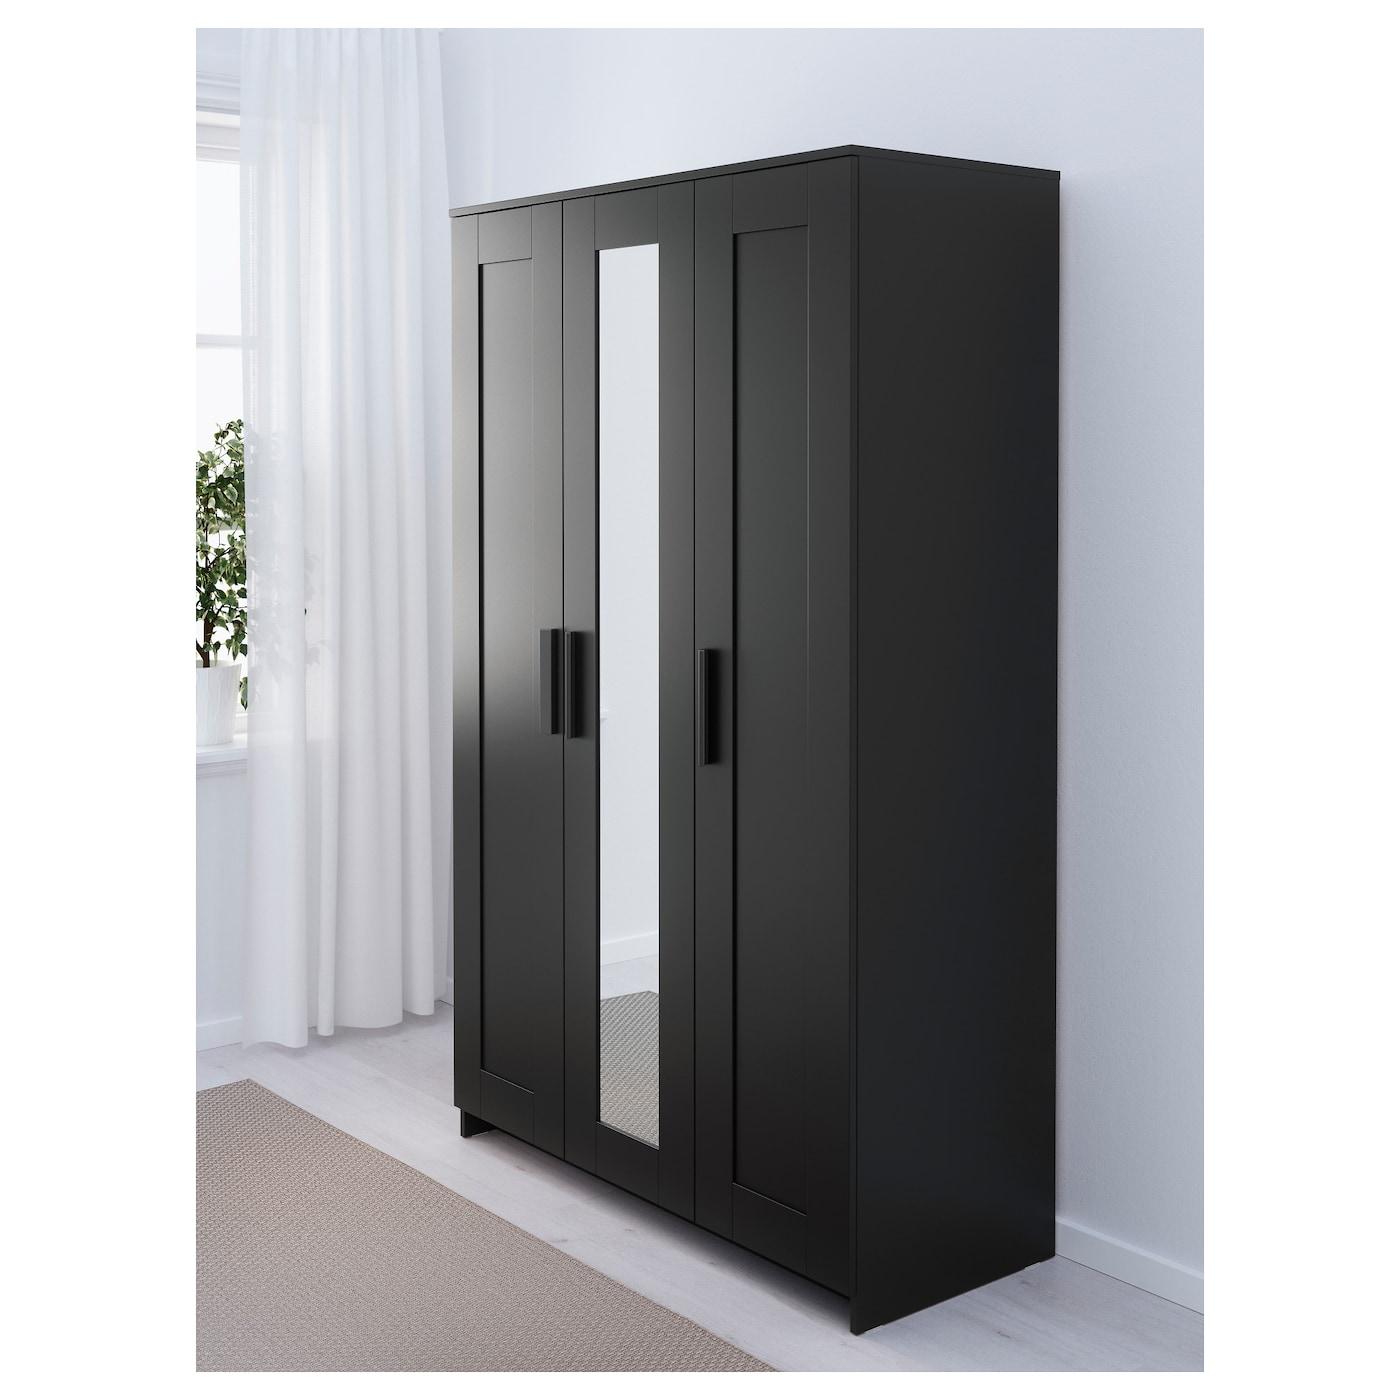 Objets Decoration Interieur : BRIMNES Wardrobe with 3 doors Black 117×190 cm  IKEA